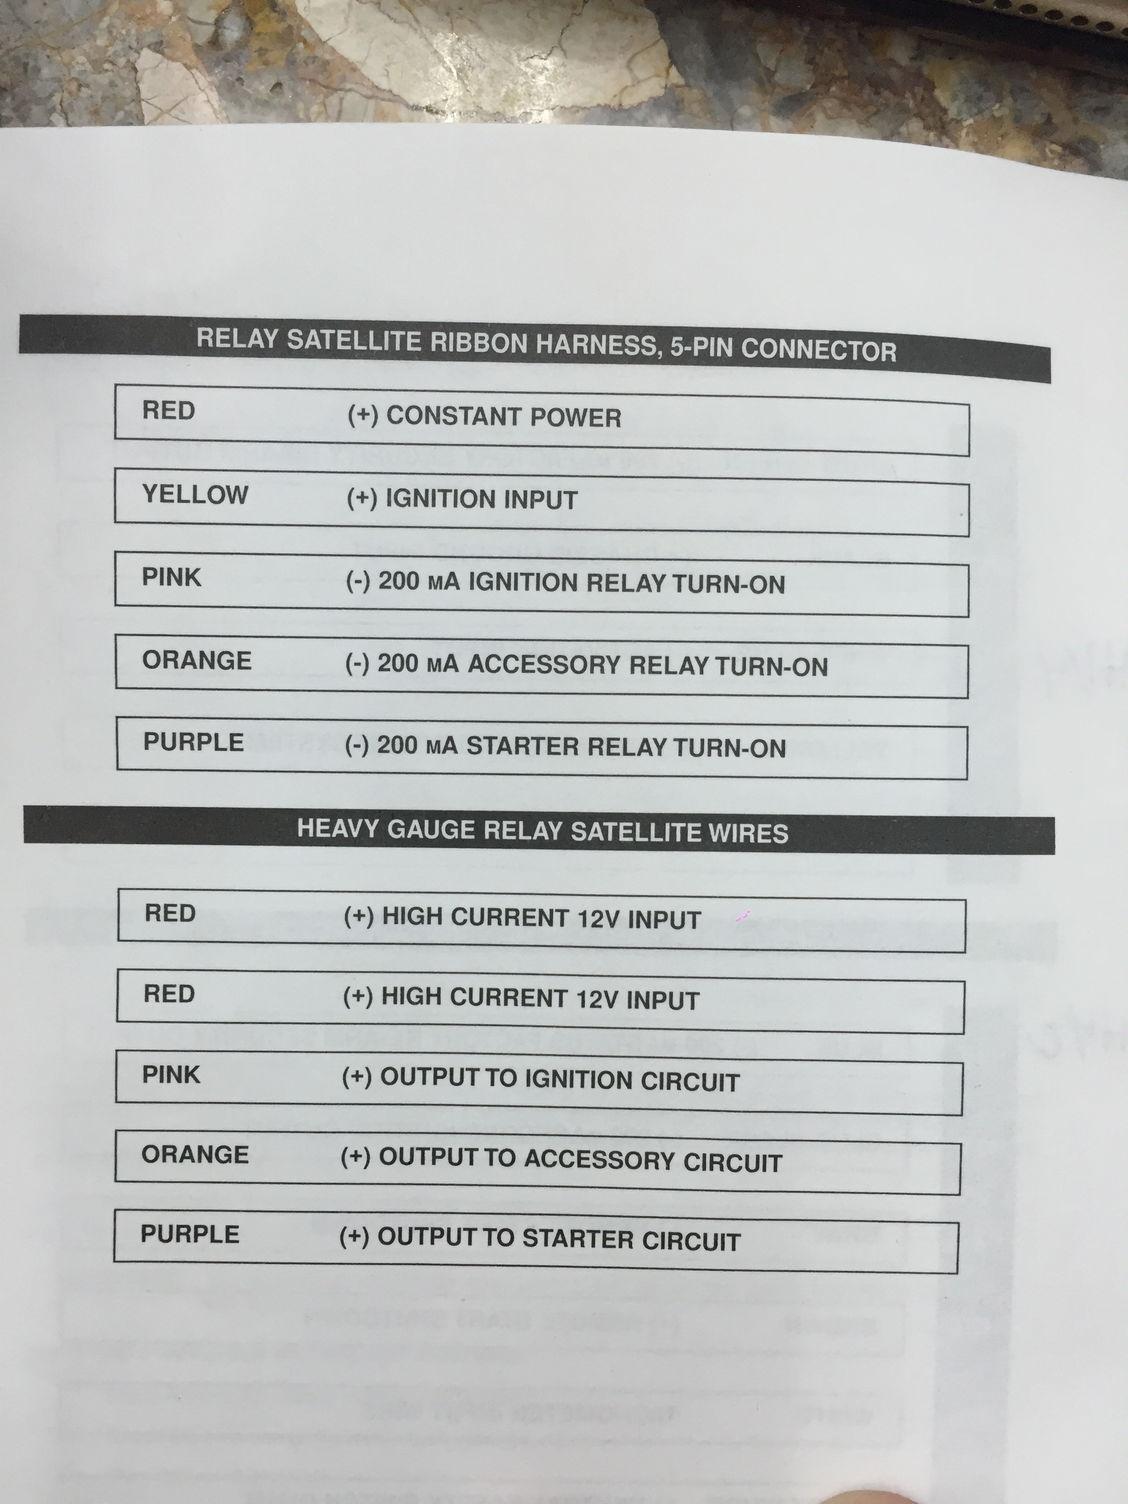 2002 honda accord alarm wiring diagram 2002 image 2002 honda accord alarm wiring diagram wiring diagram and hernes on 2002 honda accord alarm wiring